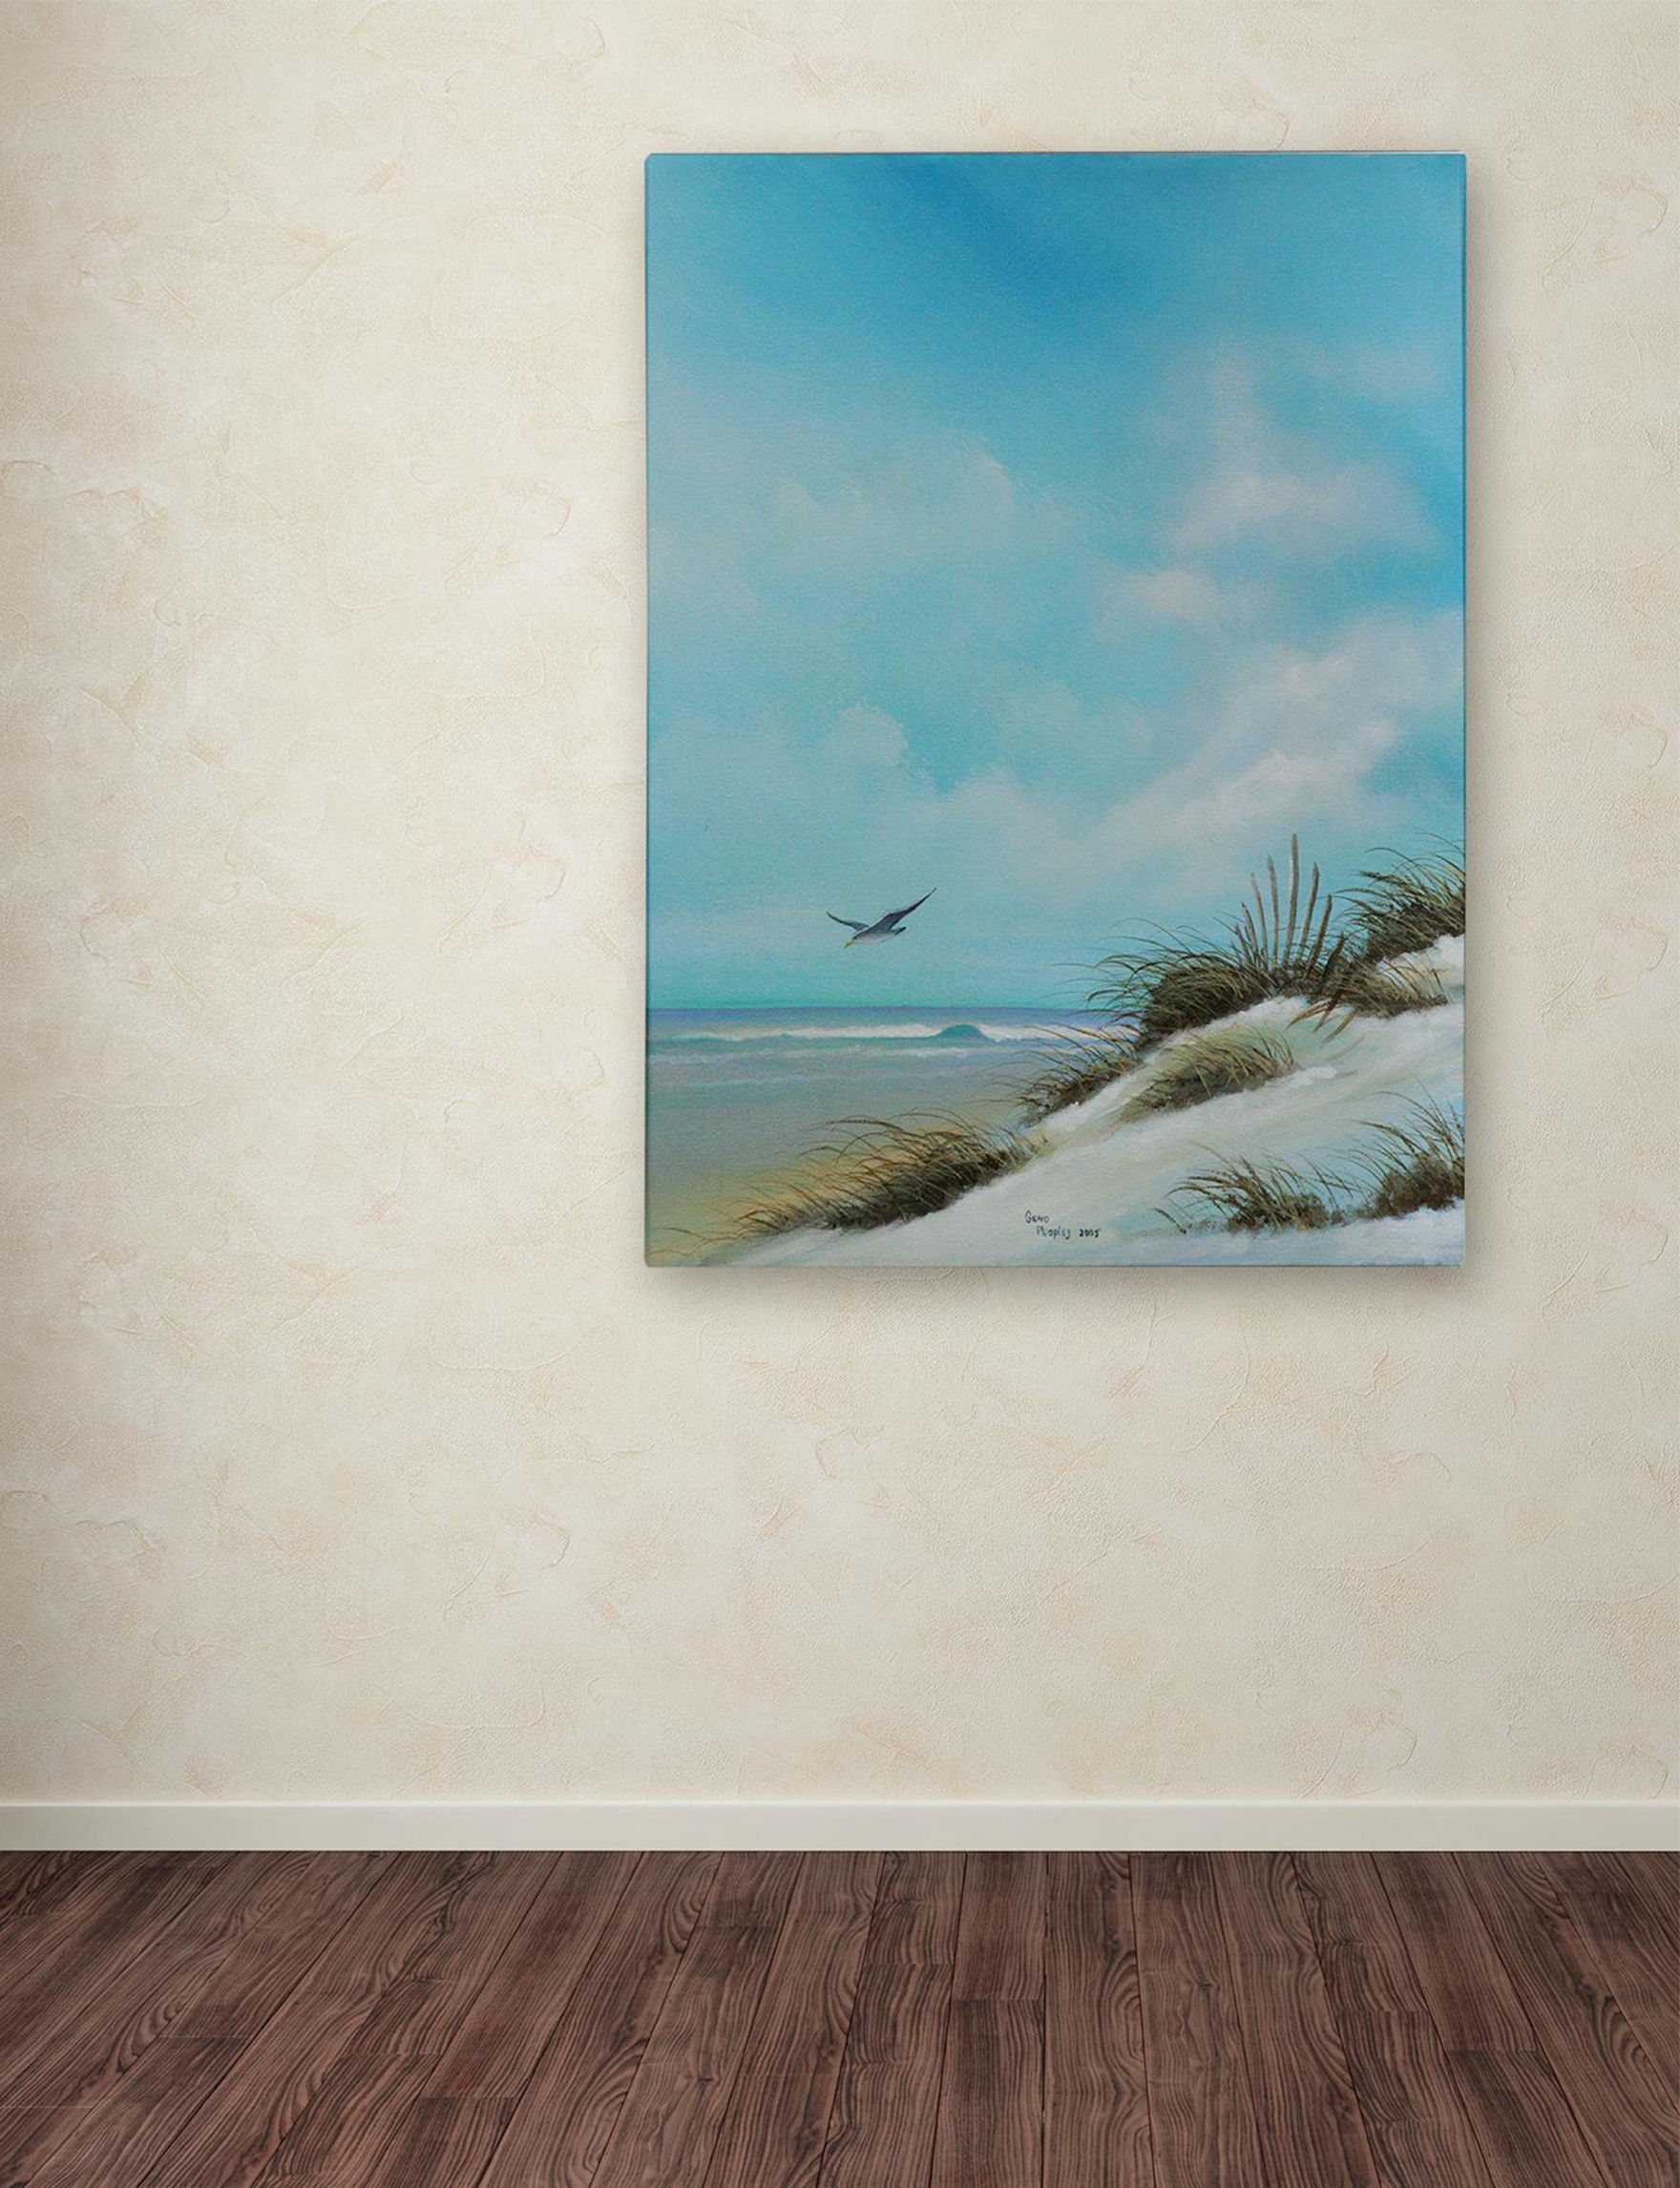 Trademark Fine Art Blue Multi Wall Art Home Accents Wall Decor